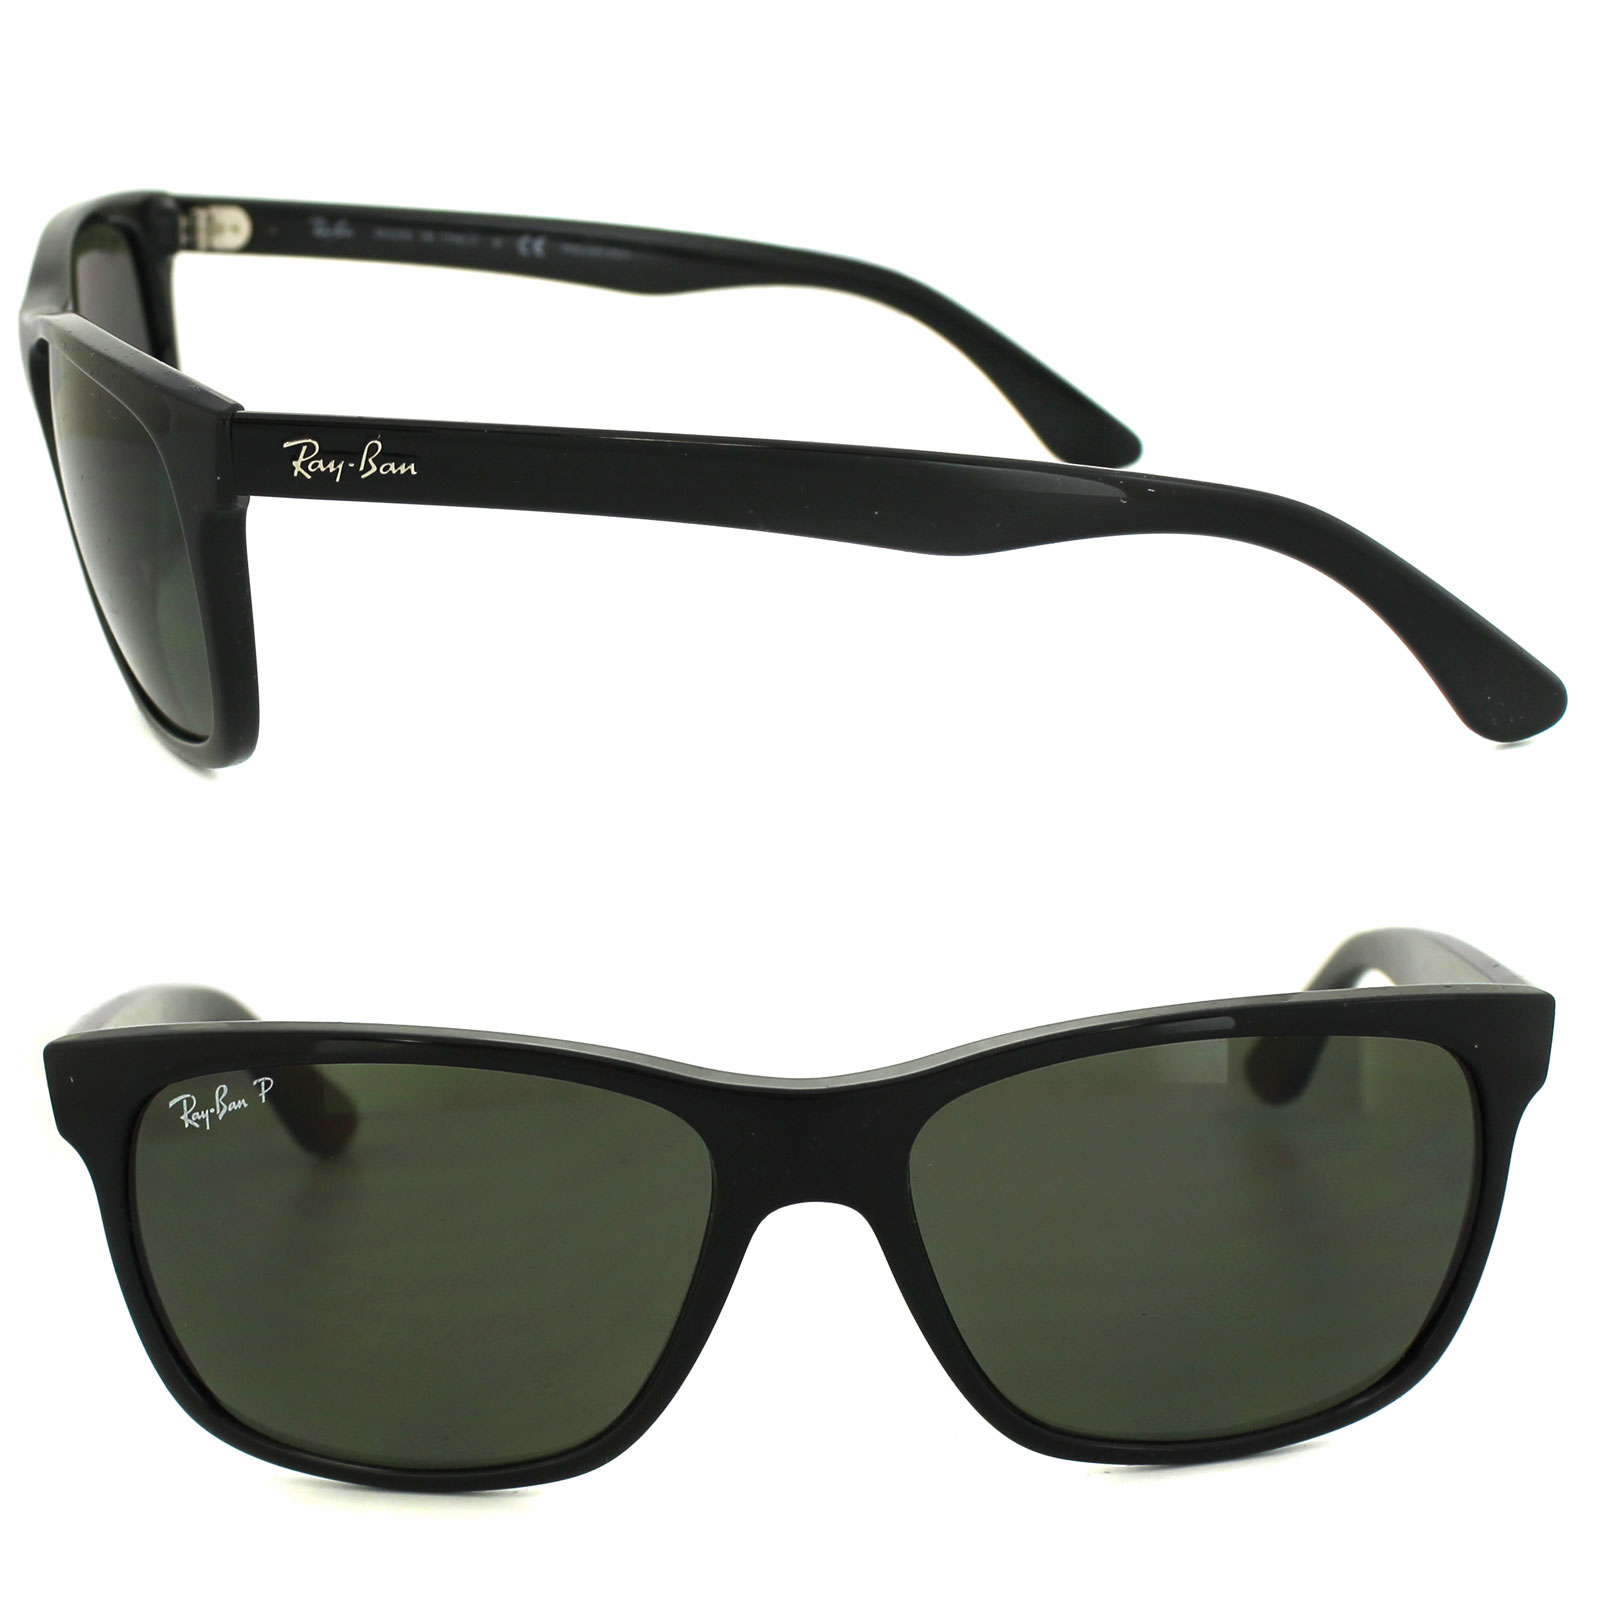 4d13b53539 RayBan Sunglasses 4181 601 9A Black Polarized Green 713132452646